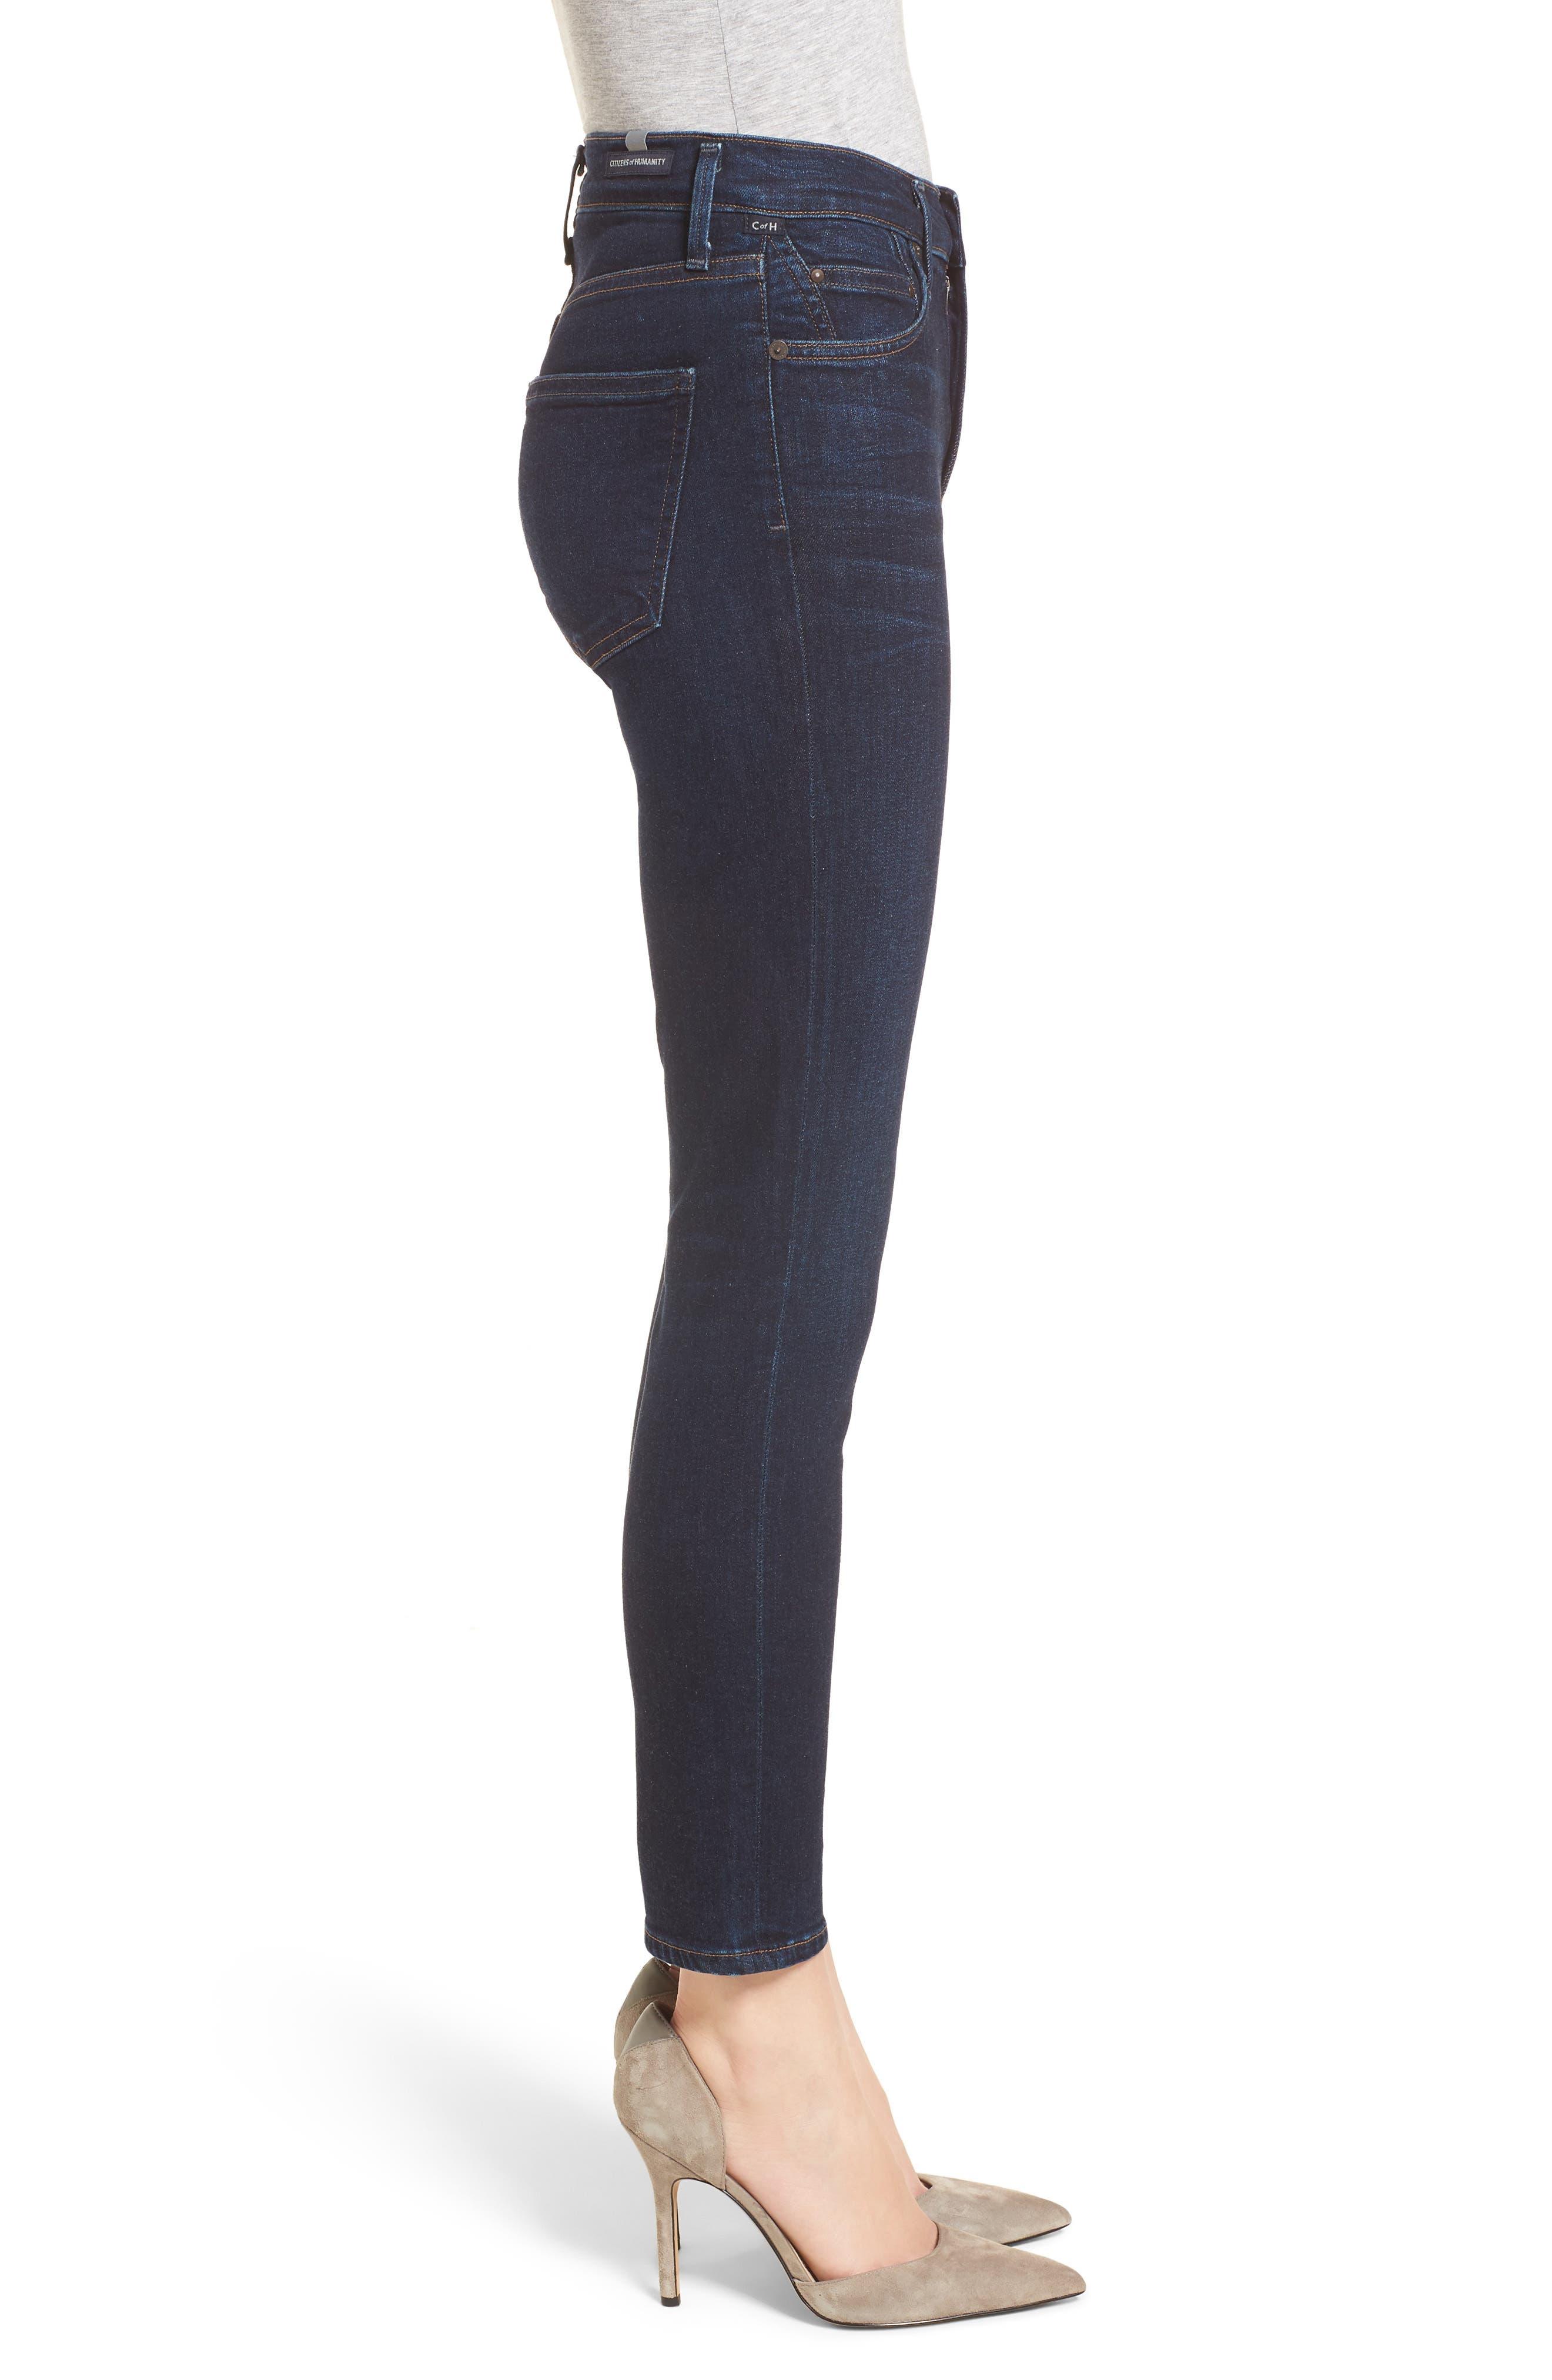 Rocket High Waist Crop Skinny Jeans,                             Alternate thumbnail 3, color,                             484